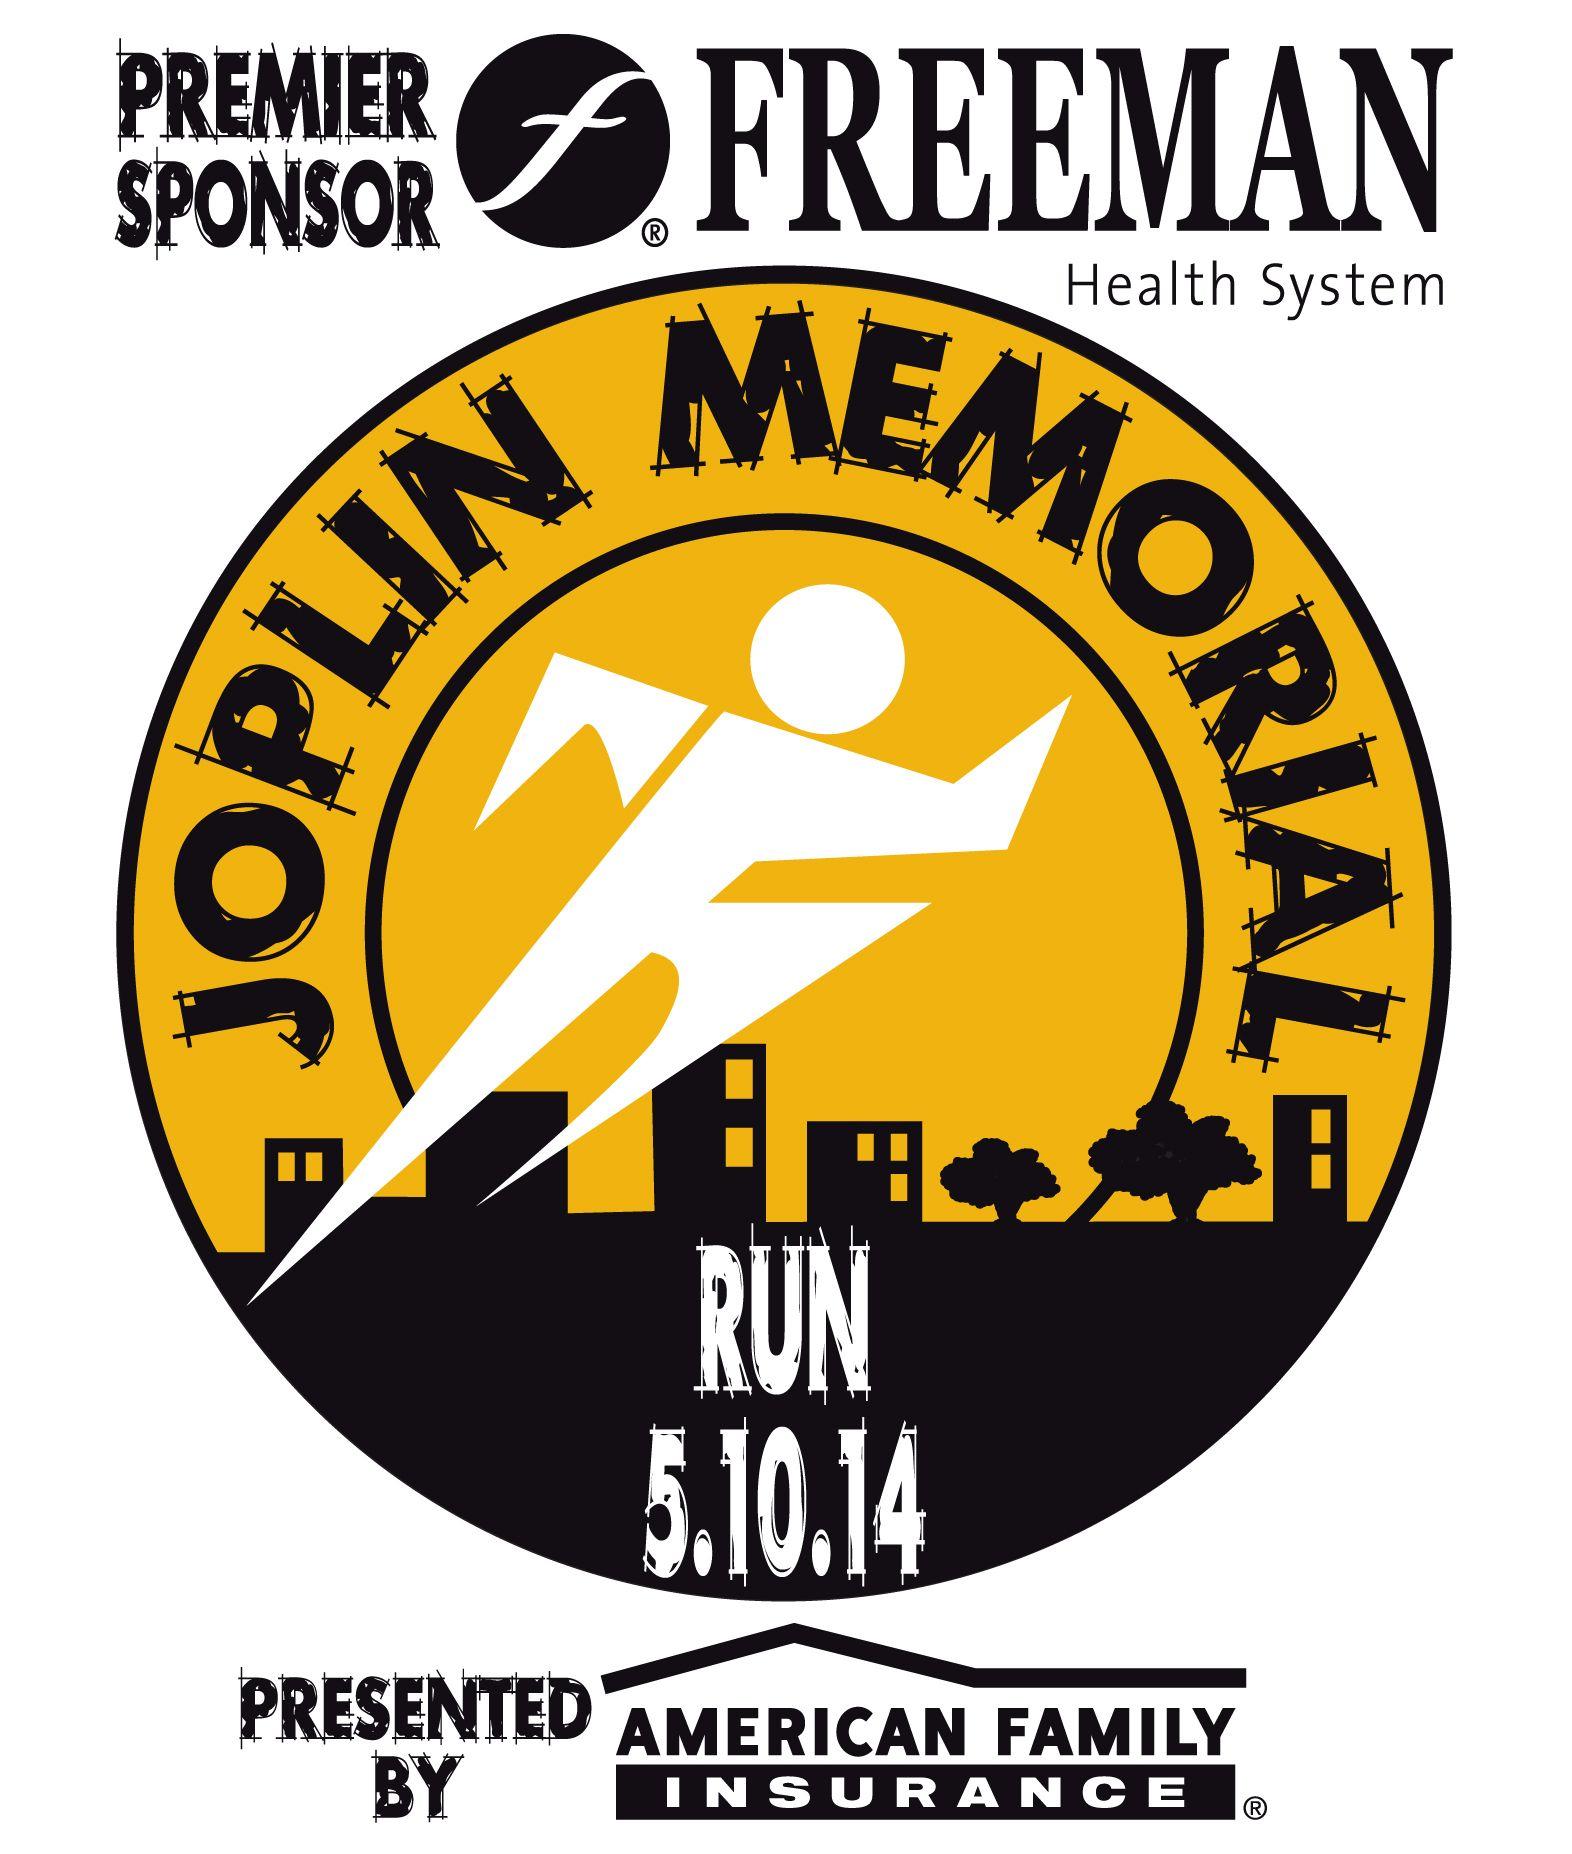 Joplin memorial run logo with images running joplin